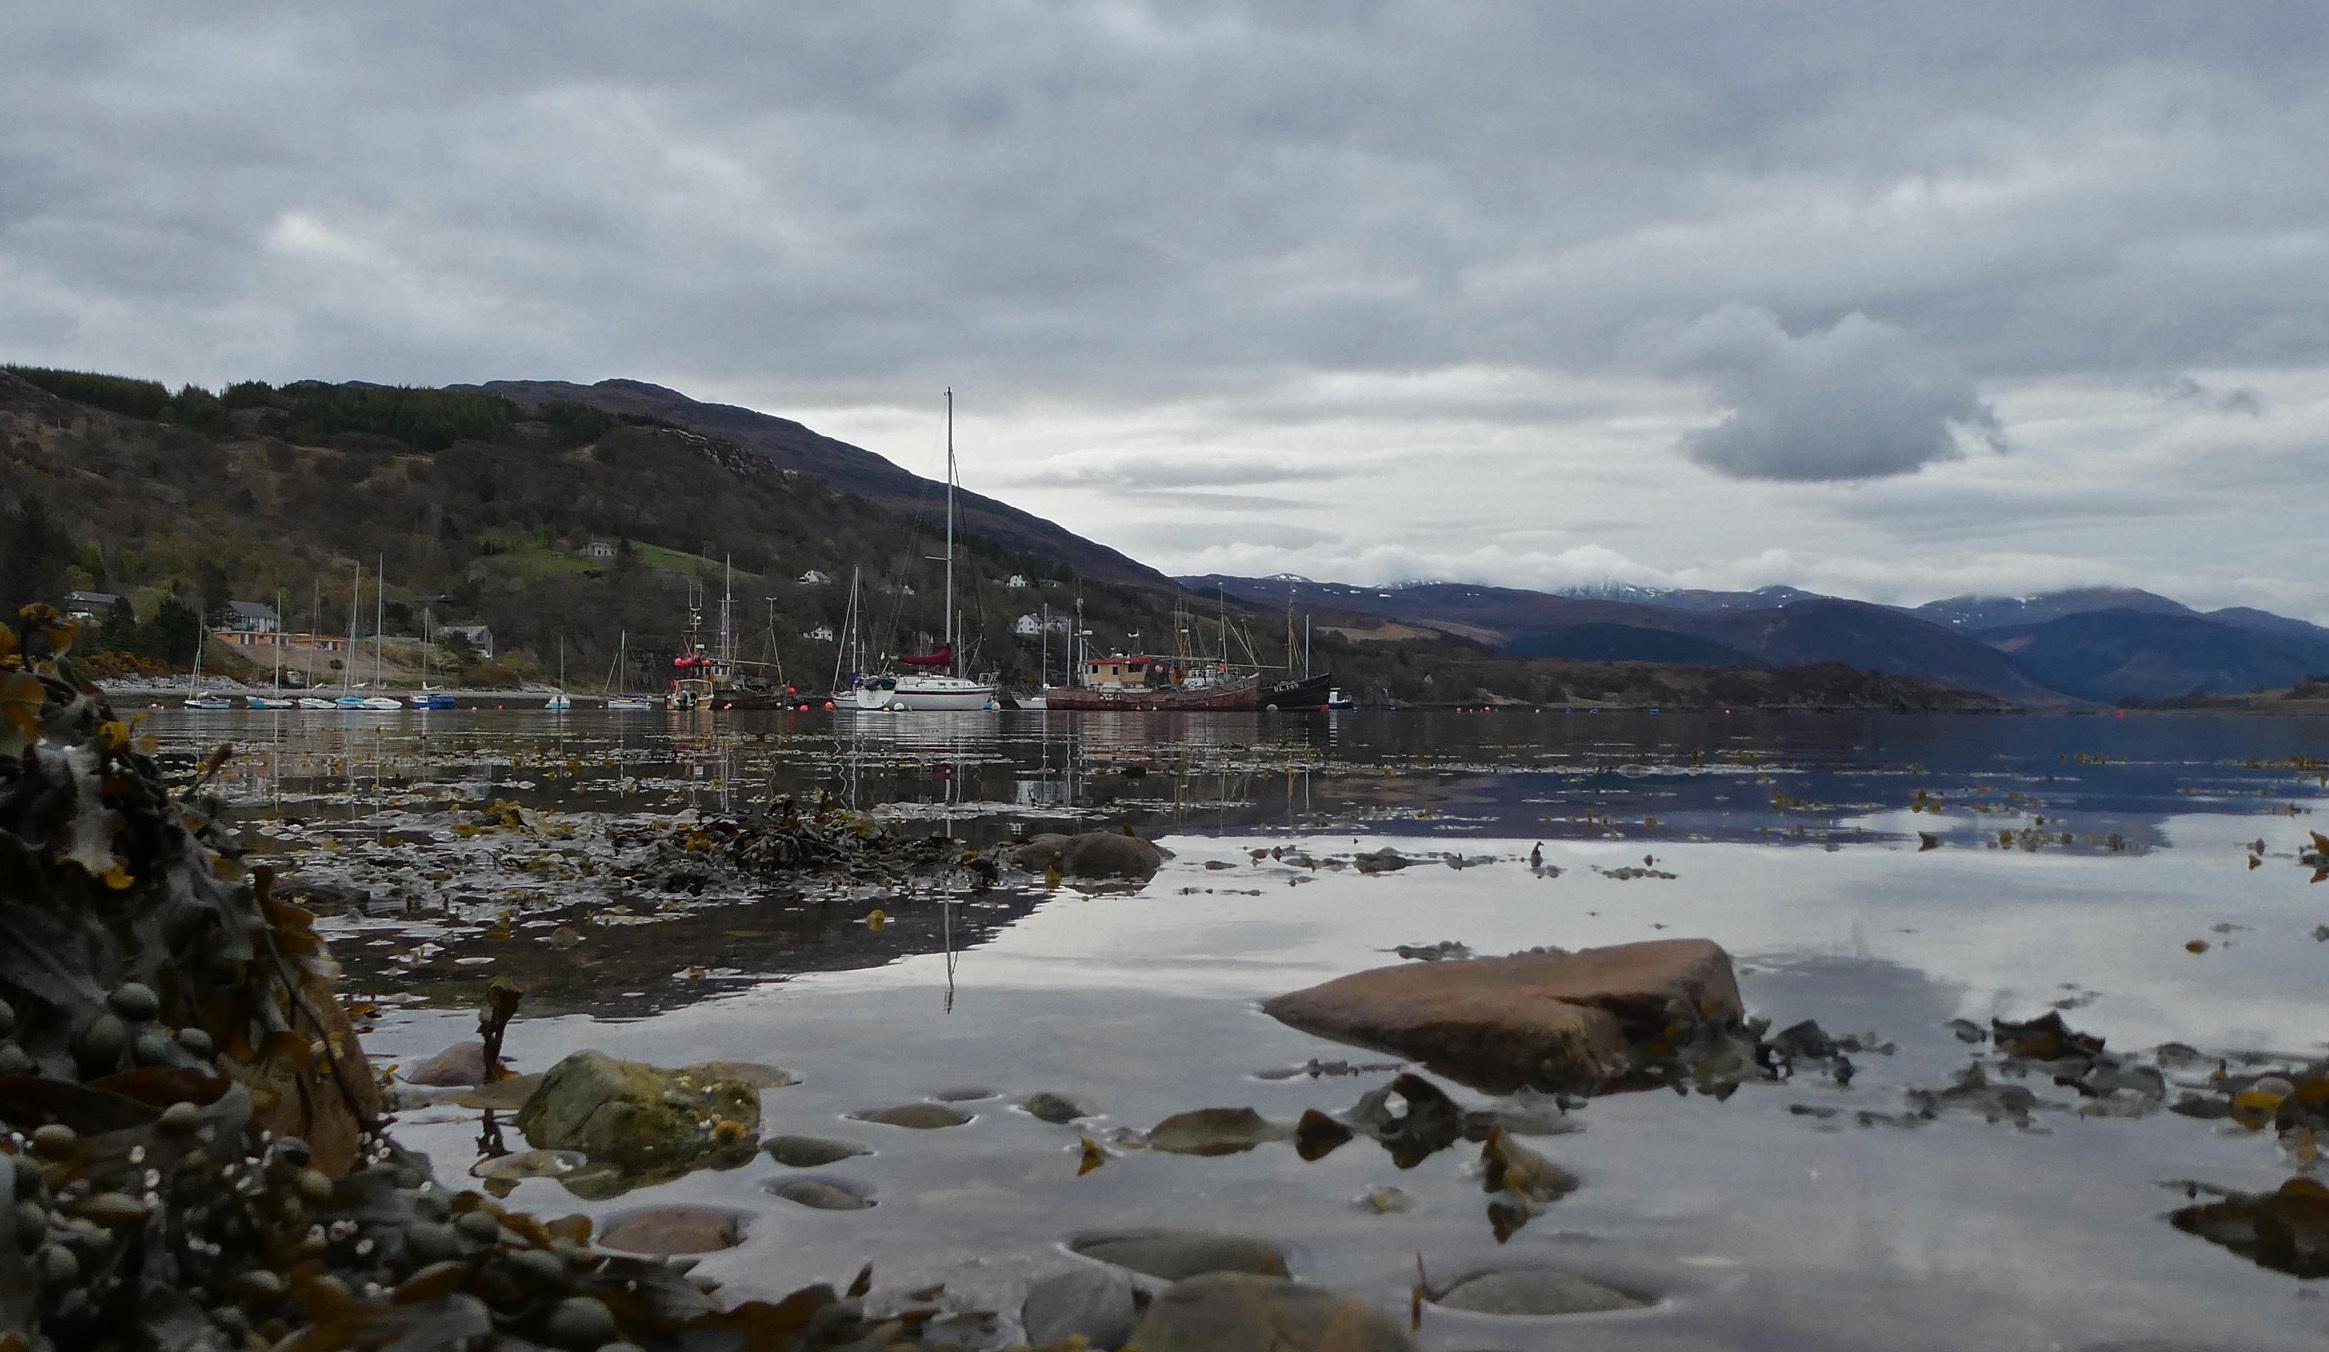 ullapool harbour 2.JPG